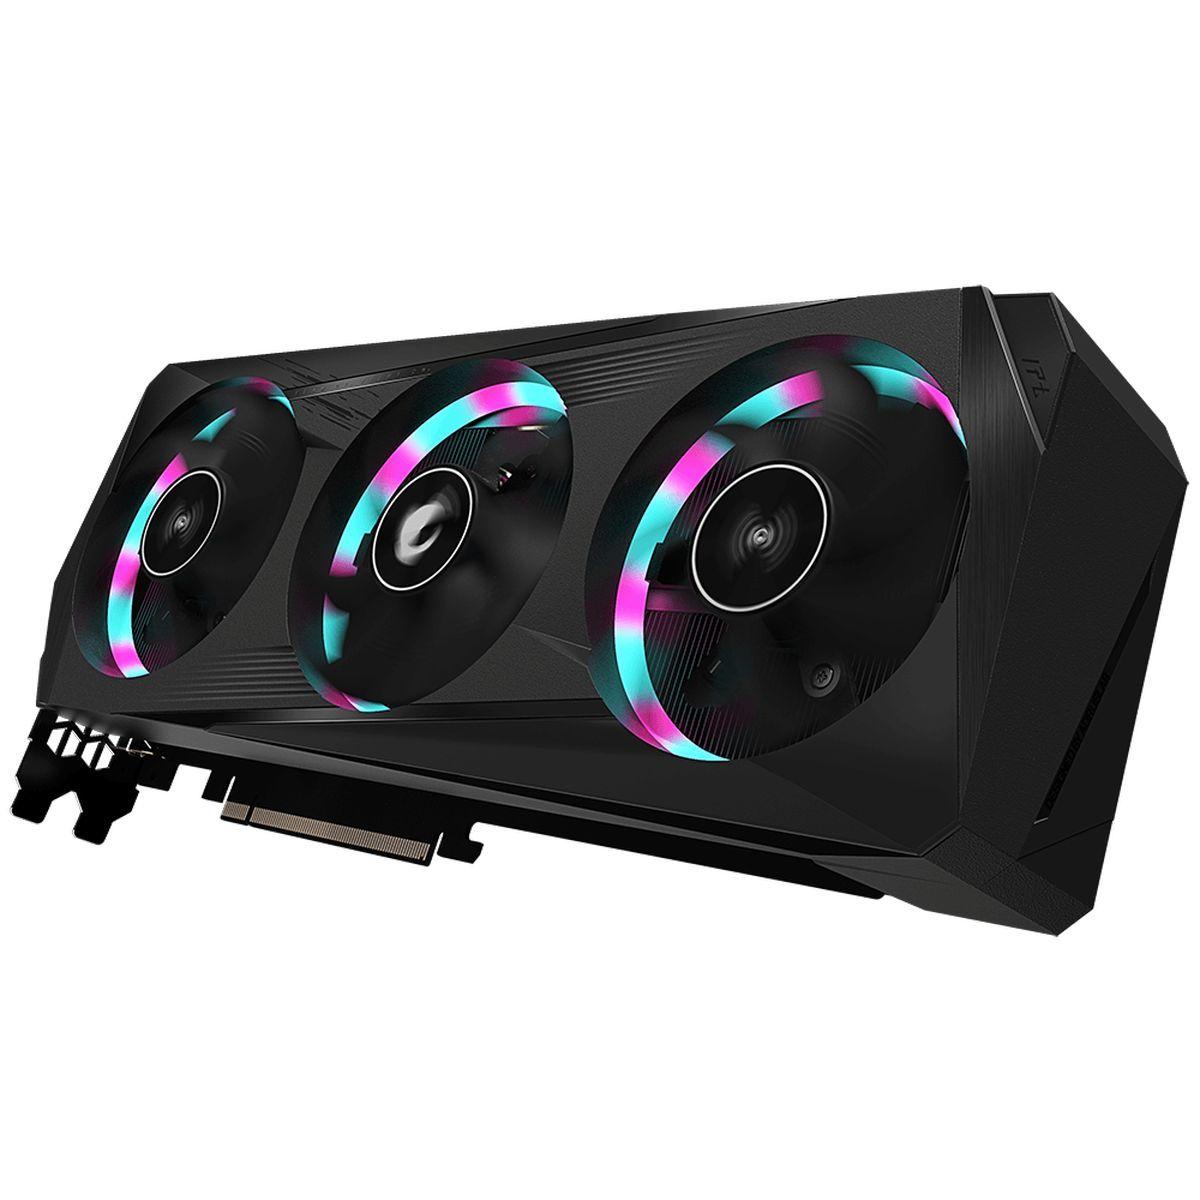 Aorus Radeon RX 6700 XT Elite 12G